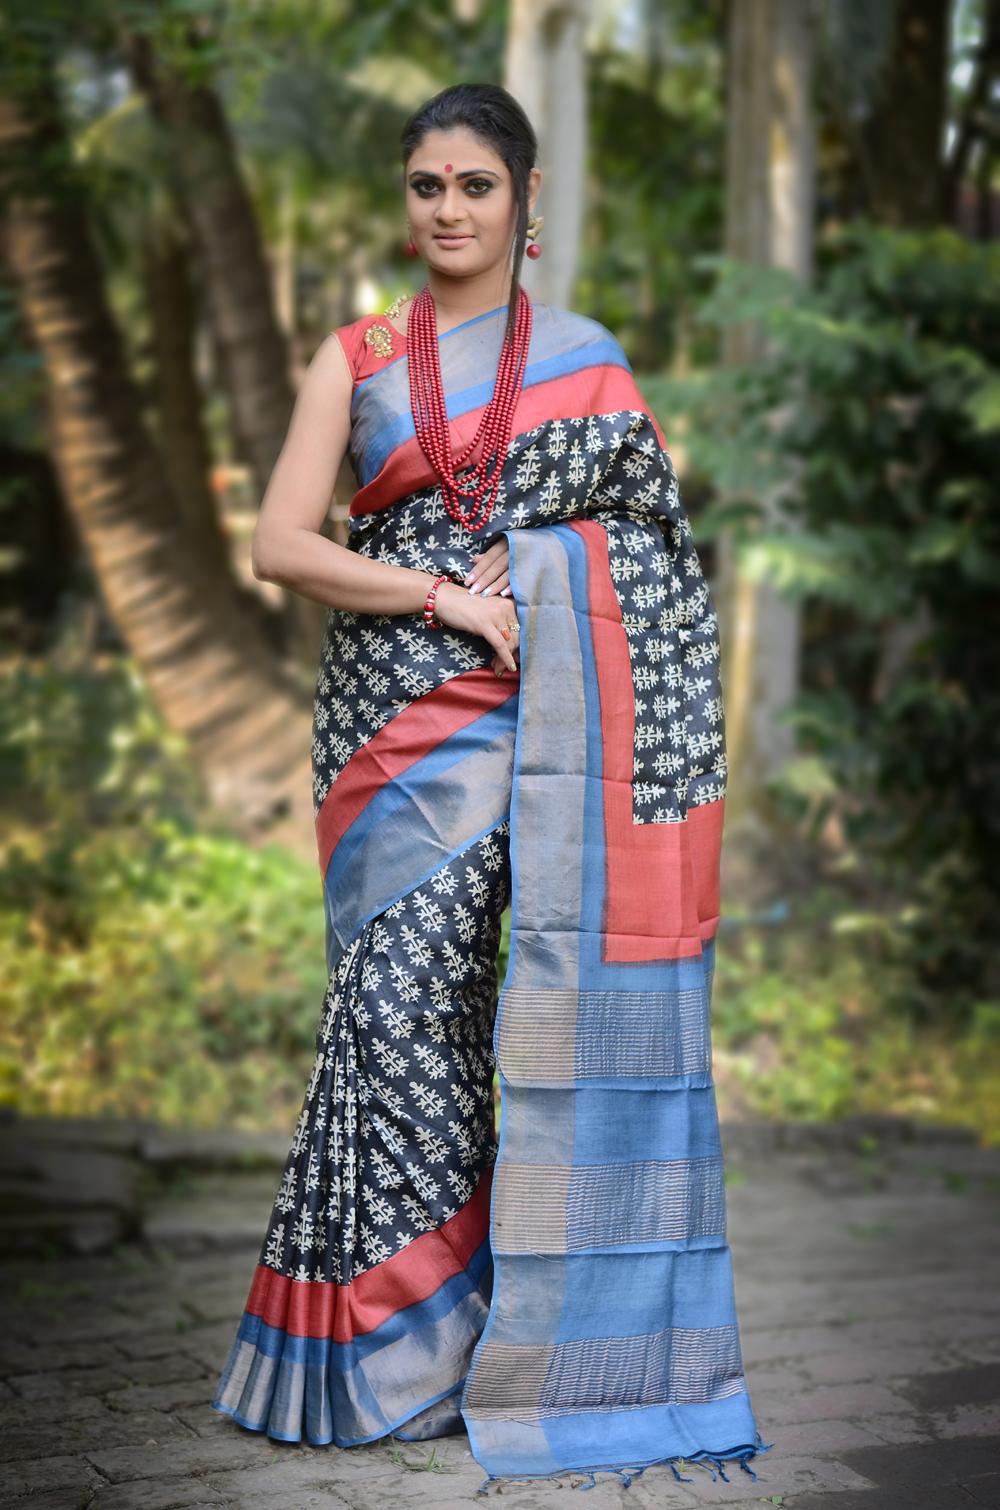 Zari Border Pure Tussar Silk Saree Bangal Handwoven Hand Block/Dyed Zari Tossor Sari with SilkMark assurance Tag 02